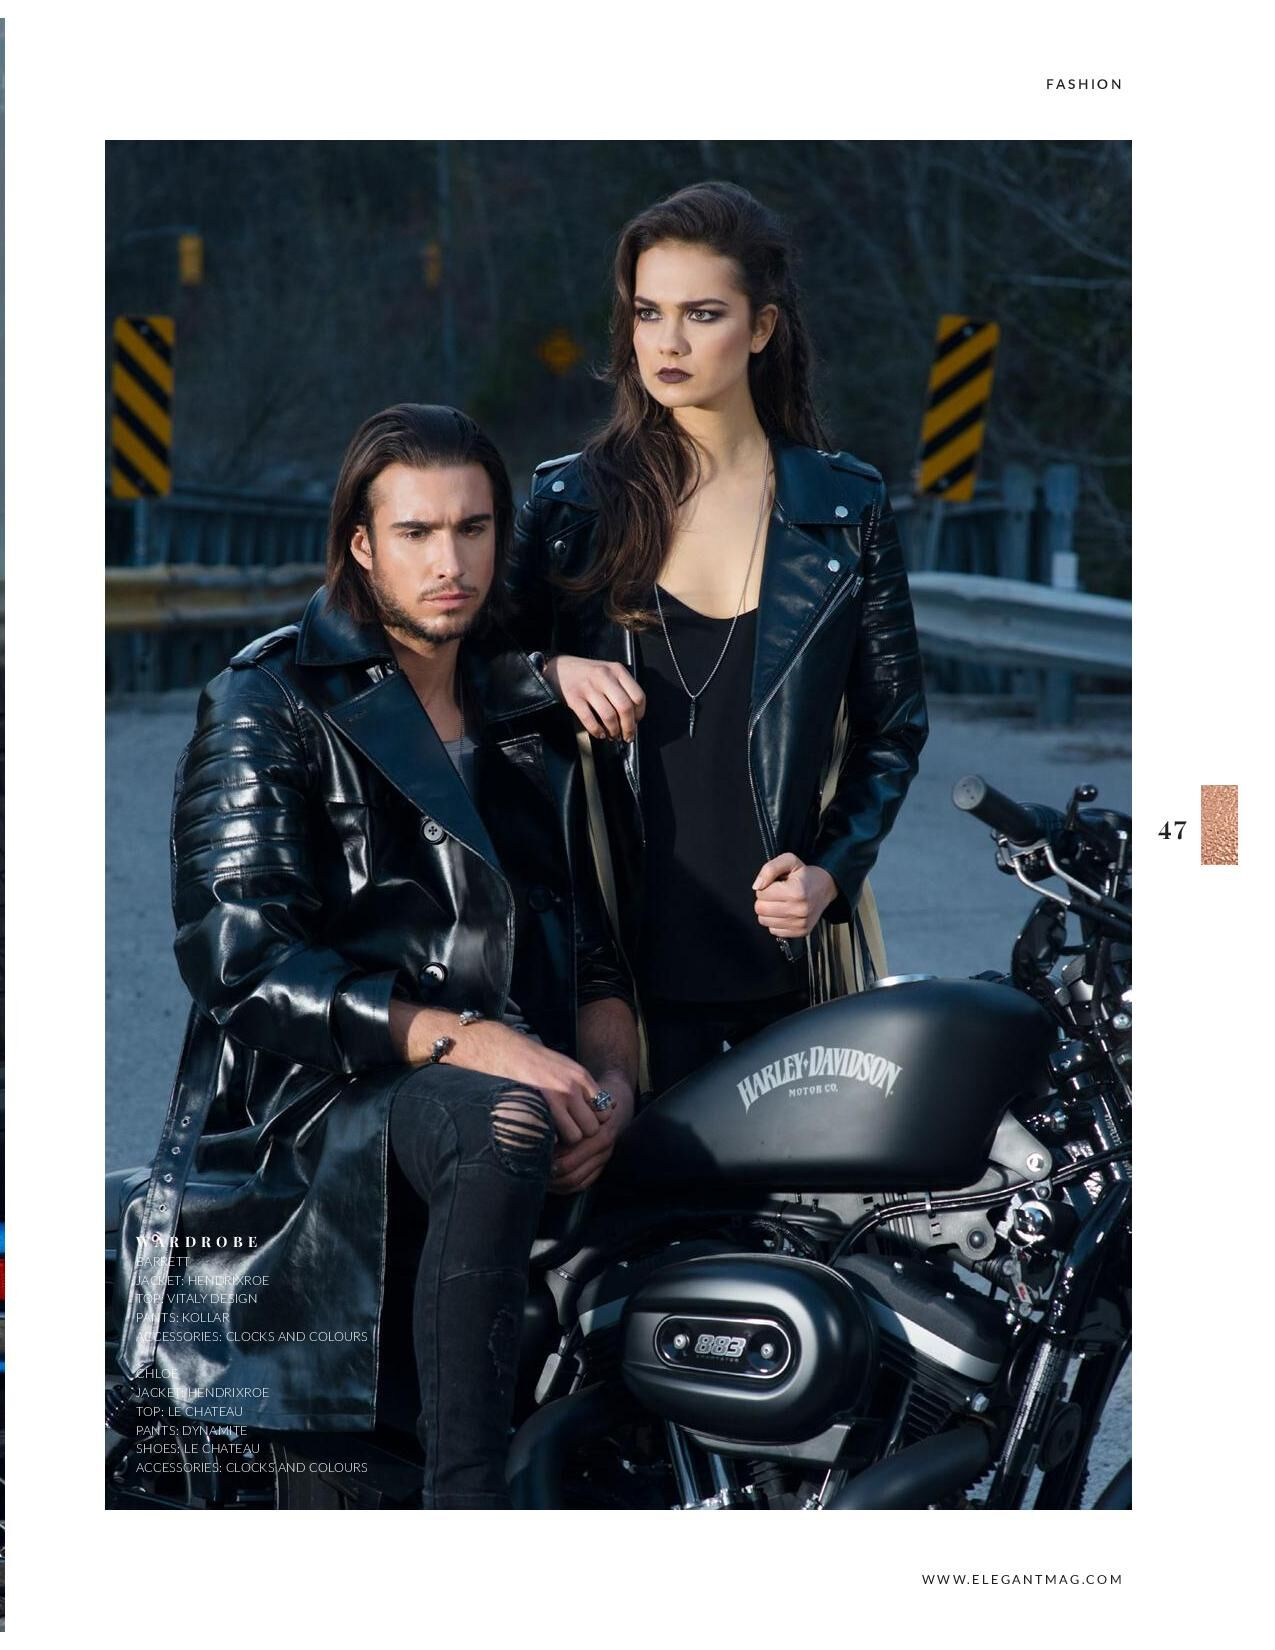 February_2018_Fashion_8_February_2018_-page-047_preview.jpeg